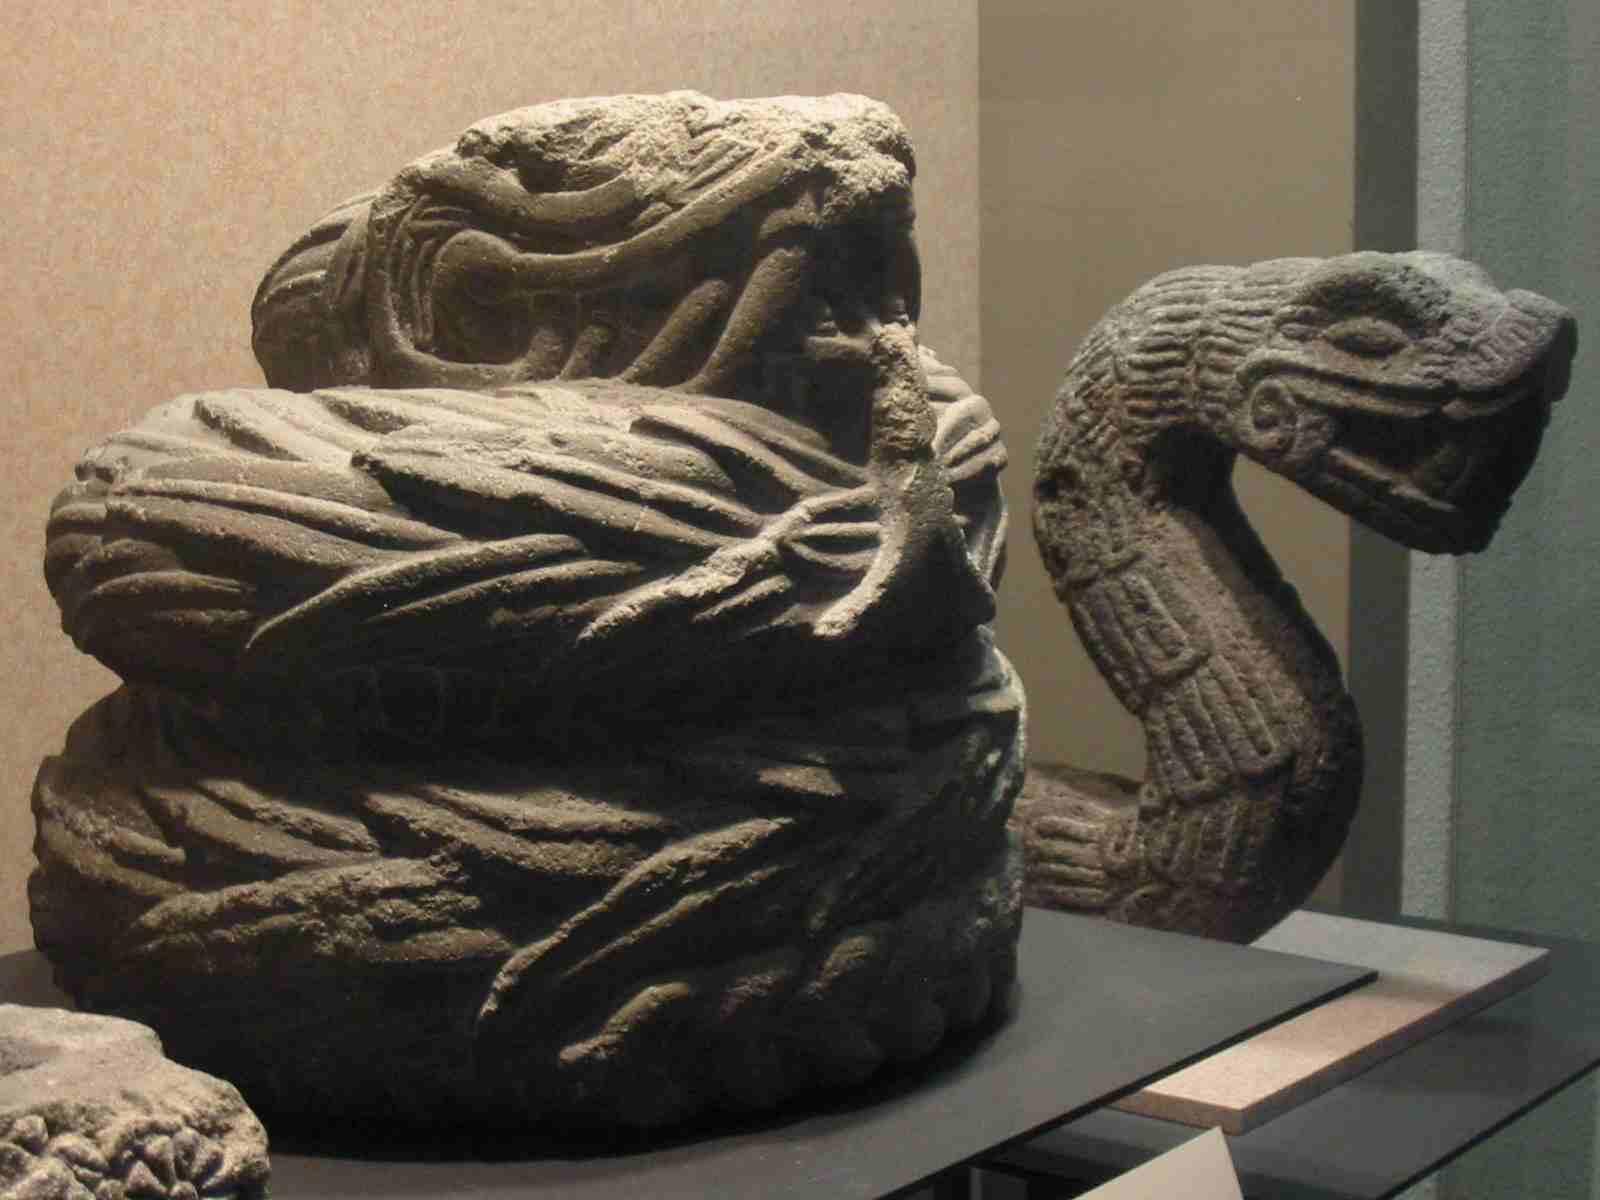 The Ubaid lizard-people figurines: Reptilians in ancient Sumer?? 3